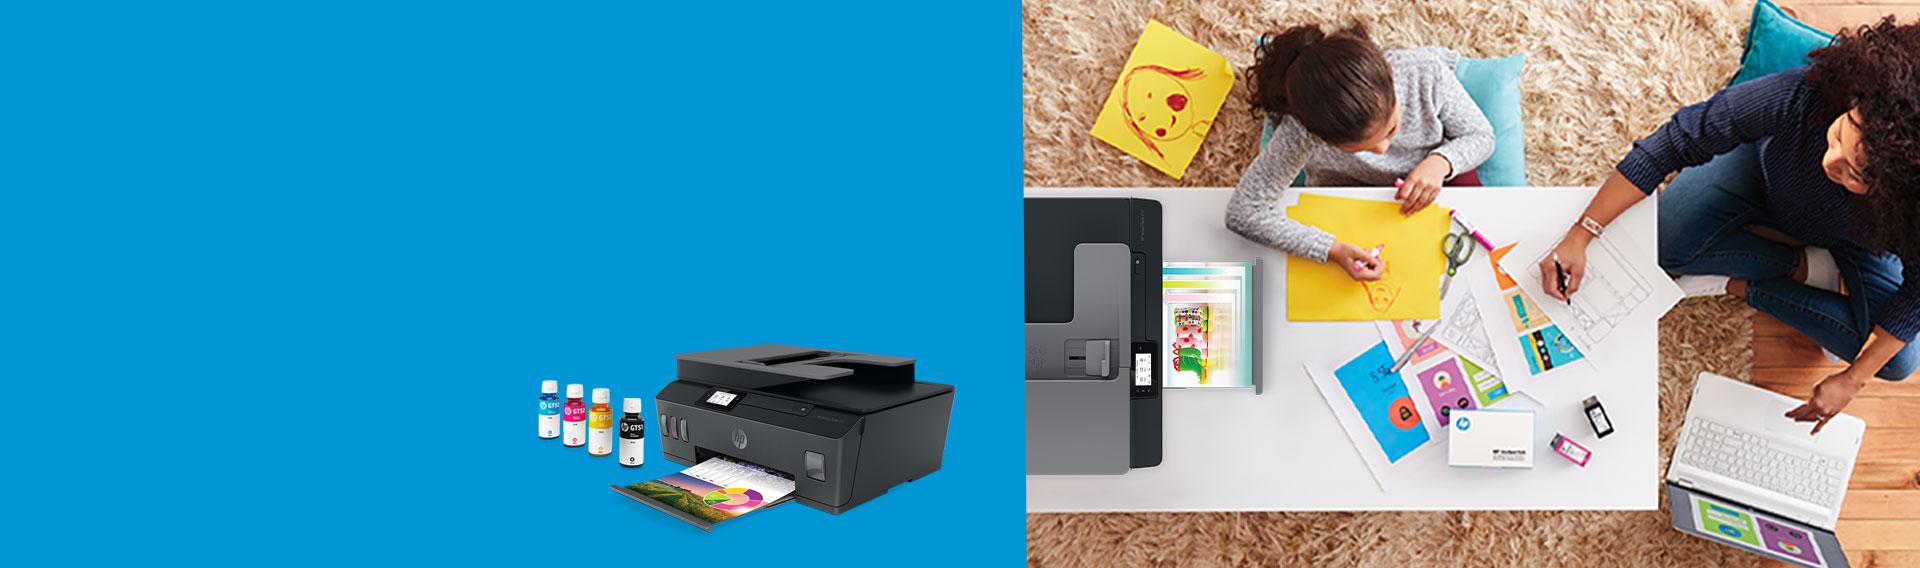 Impresoras HP con Envío Gratis. Preparado. Listo. Imprimí. Experimentá textos nítidos y colores vibrantes.